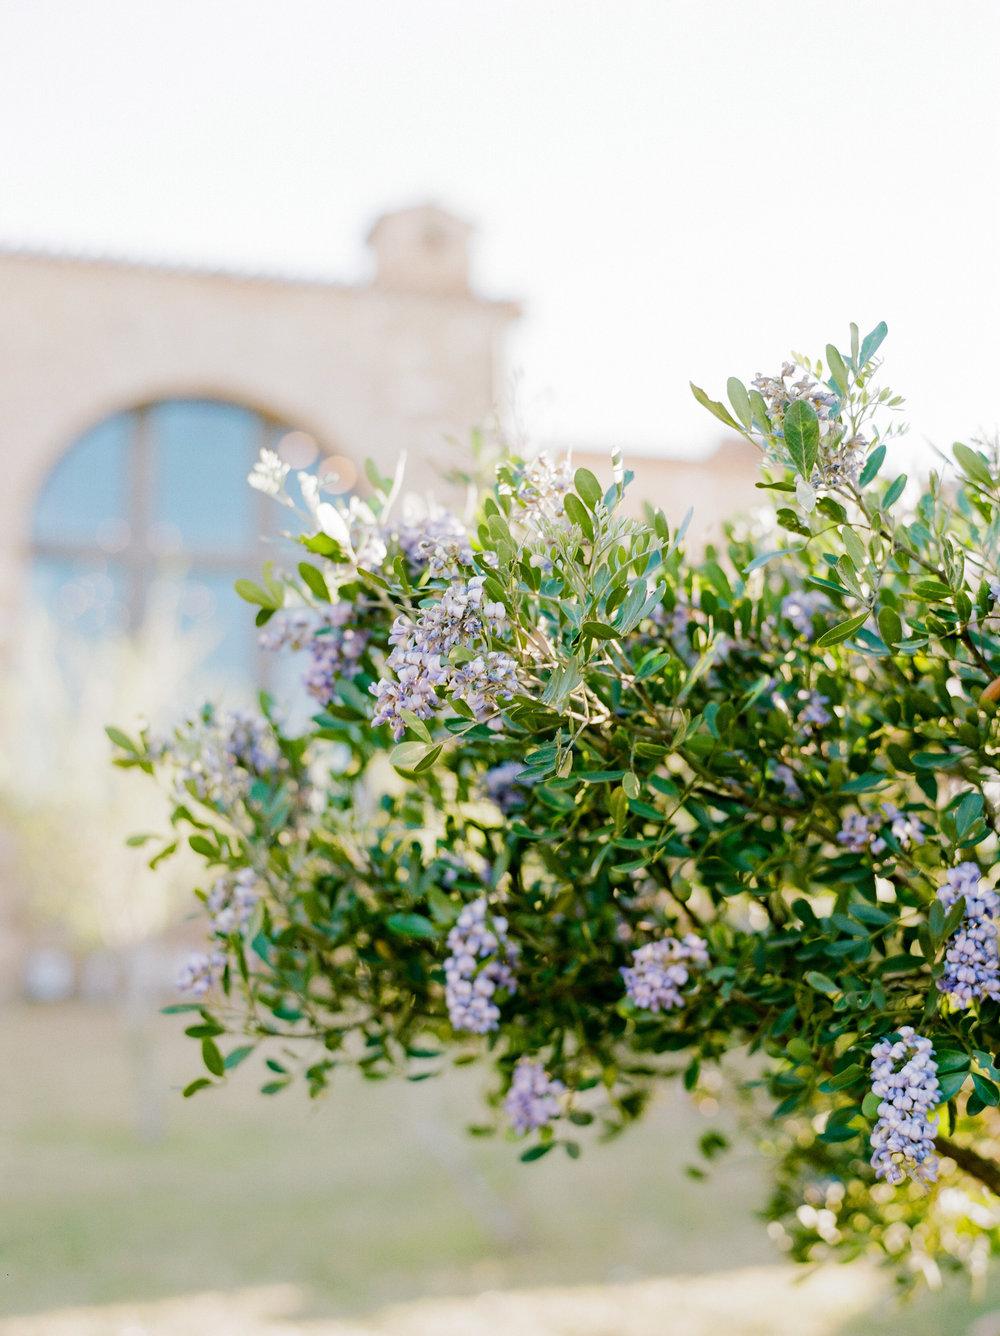 Escondido-Golf_Lake-Club-Hill-Country-Houston-Wedding-Photographer-Best-Top-Luxury-Destination-Engagements-Portrait-Austin-Photography-75.jpg